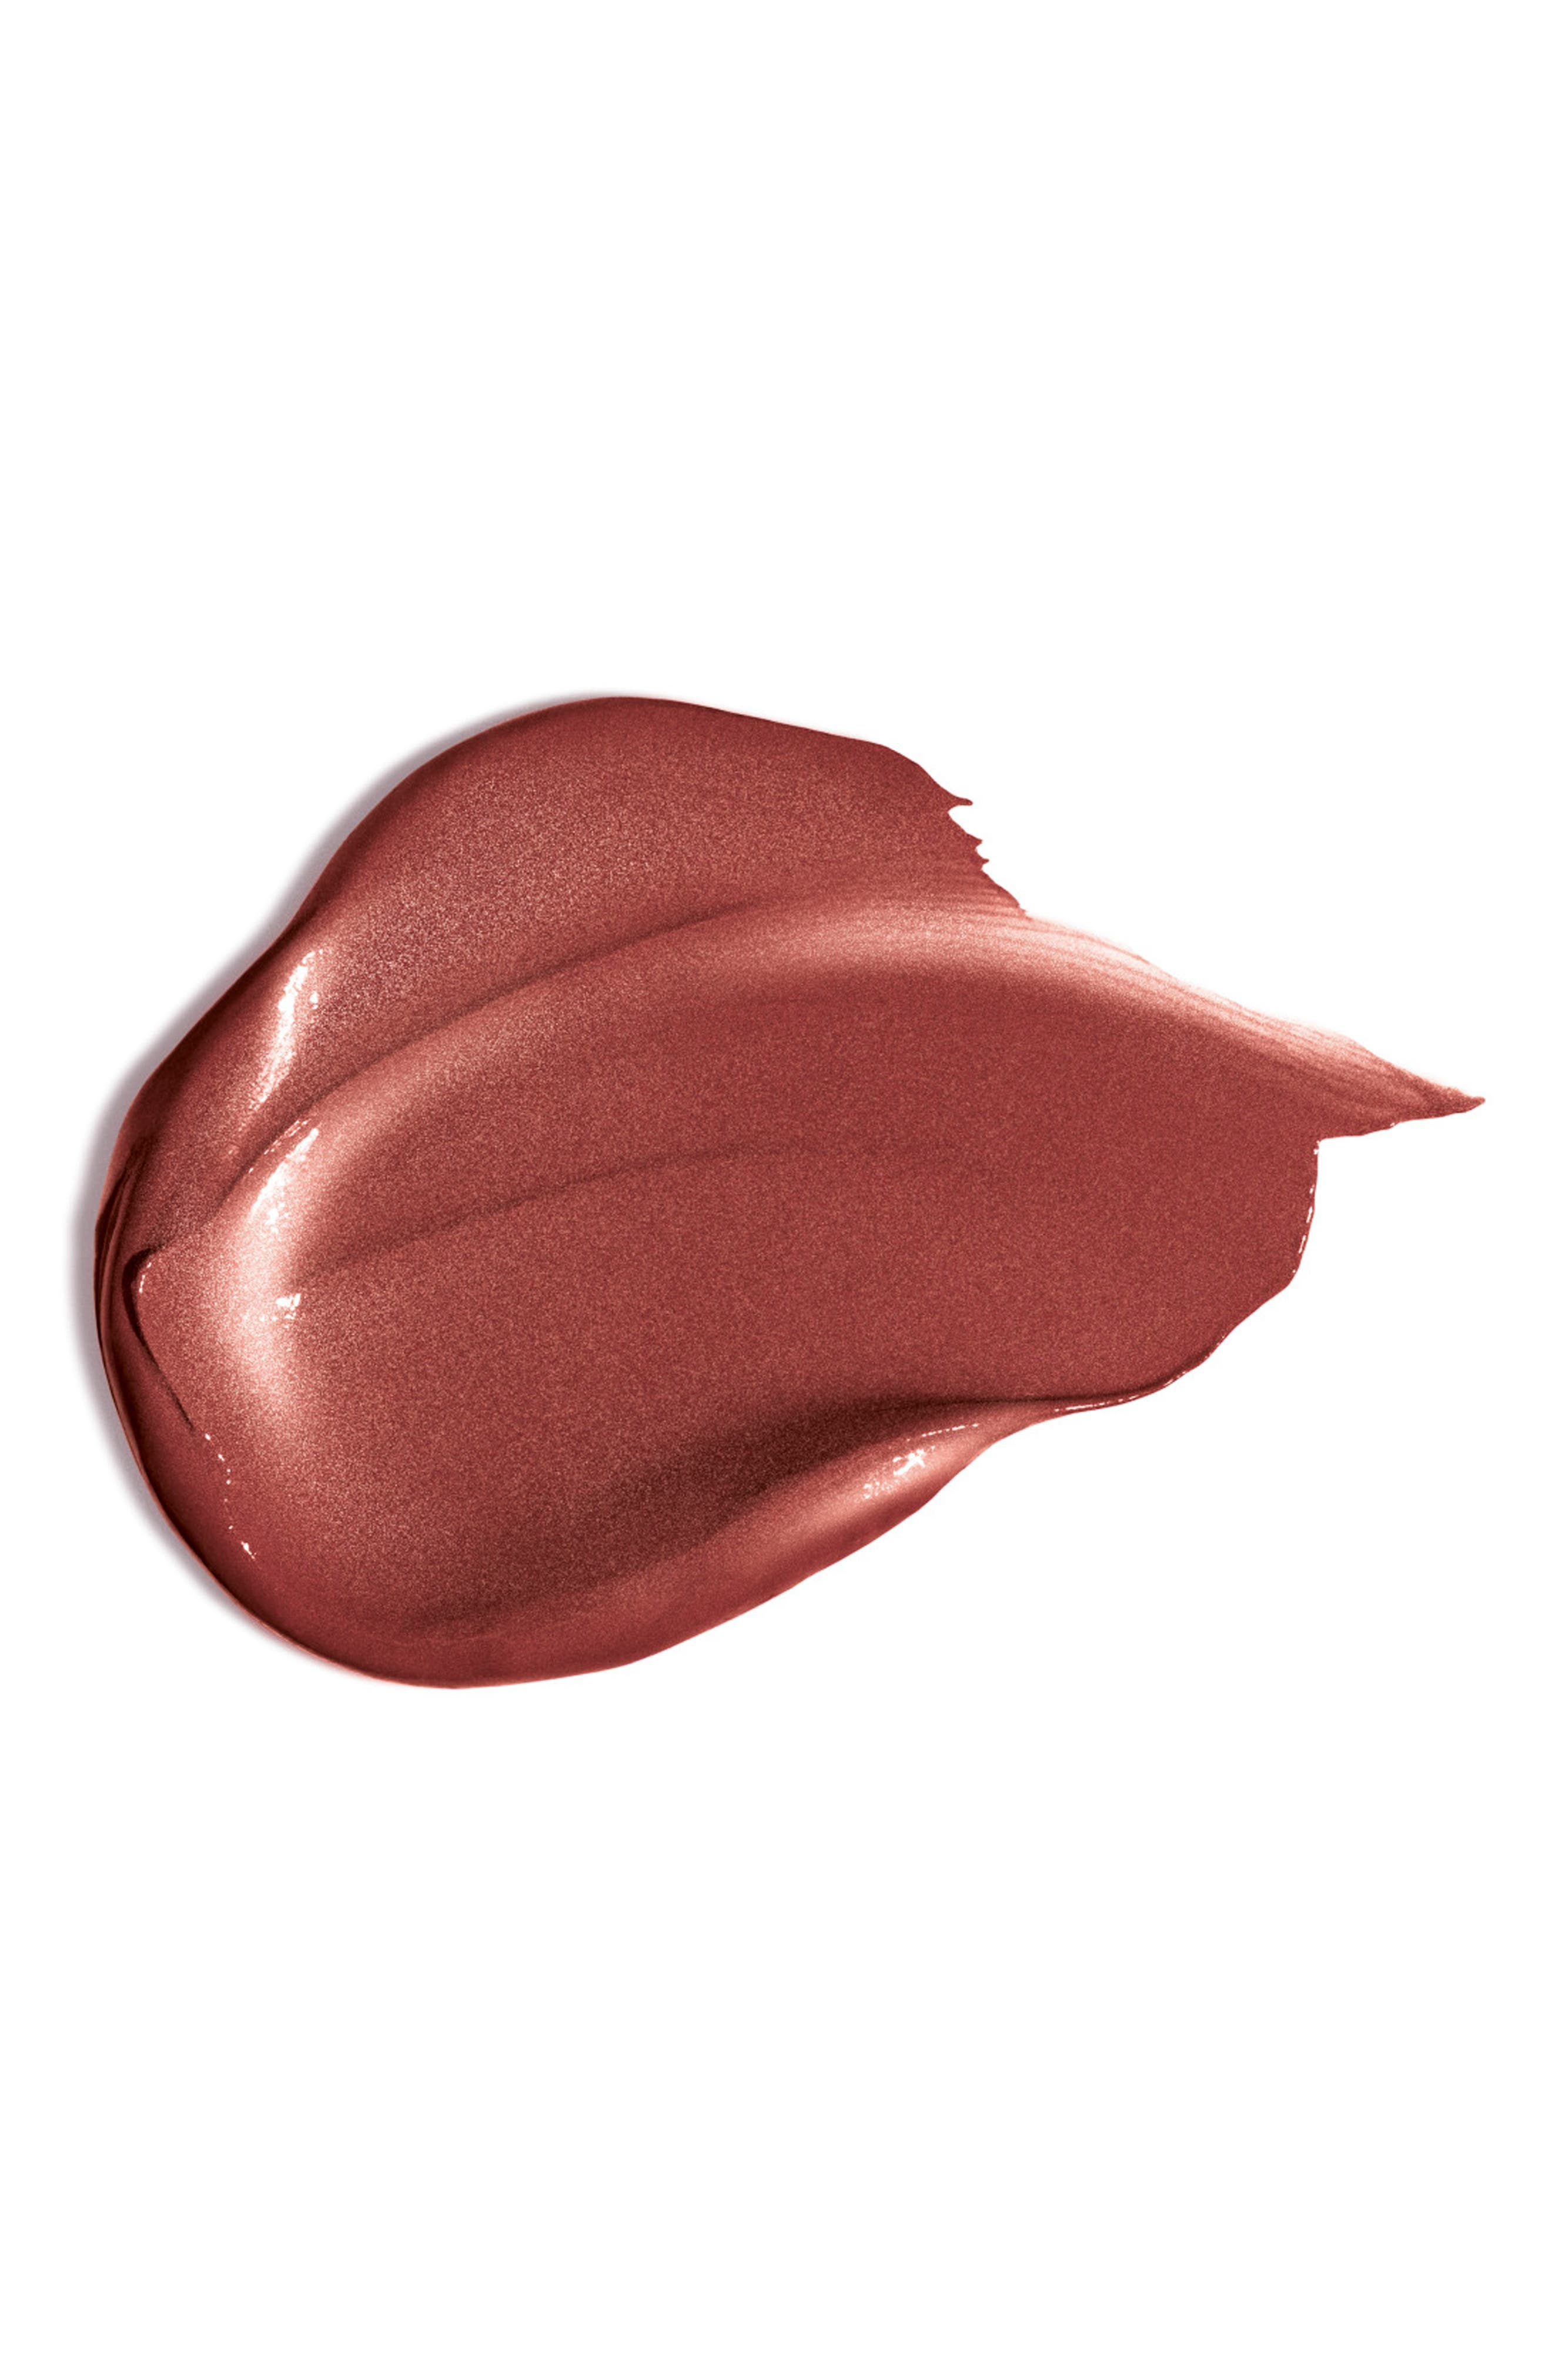 Joli Rouge Brilliant Sheer Lipstick,                             Alternate thumbnail 2, color,                             757 NUDE BRICK